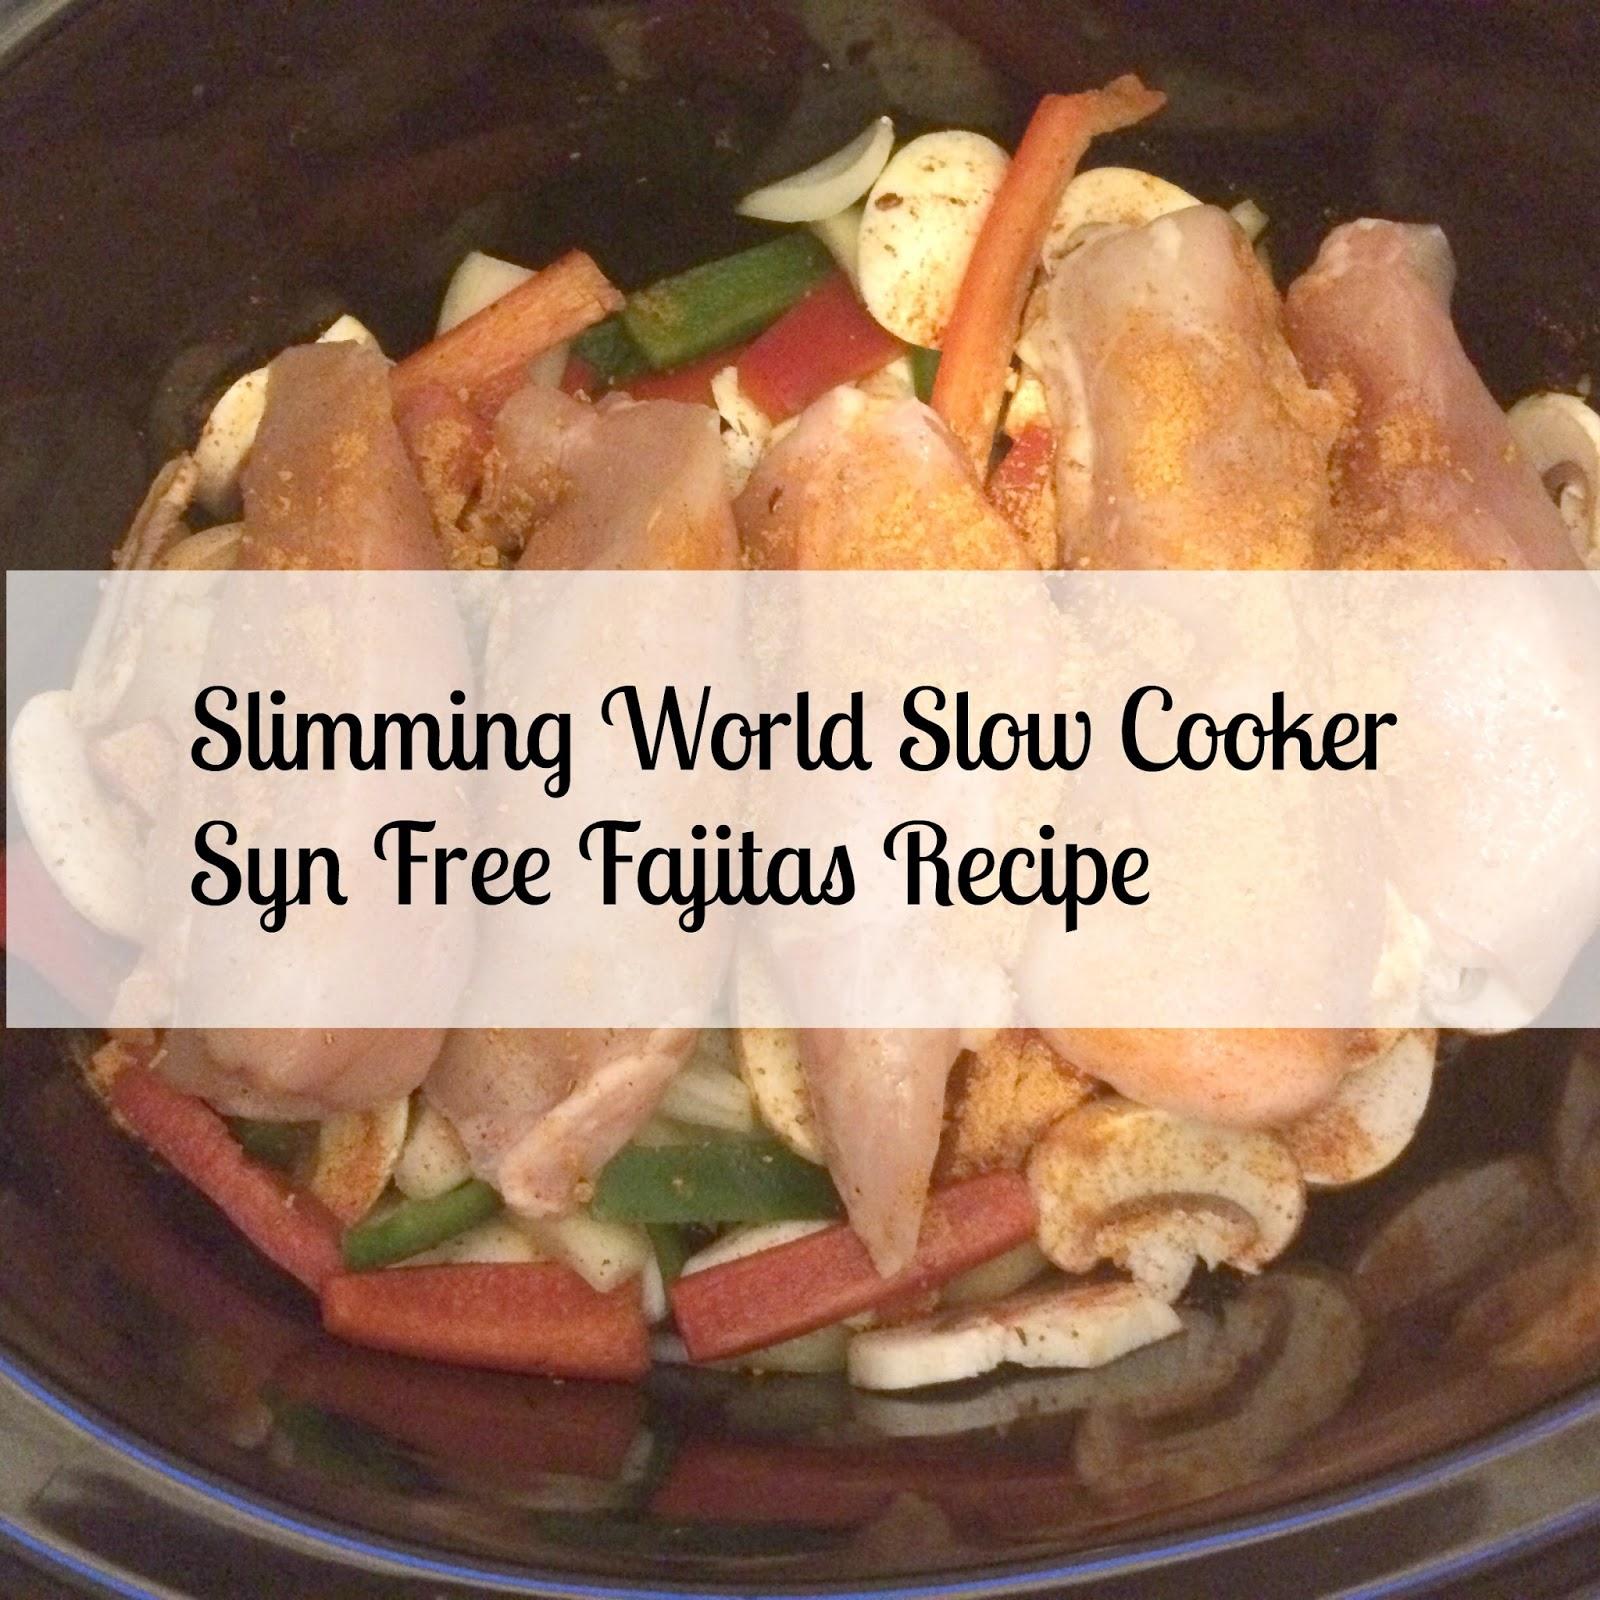 Slimming World Slow Cooker Chicken Fajitas Recipe